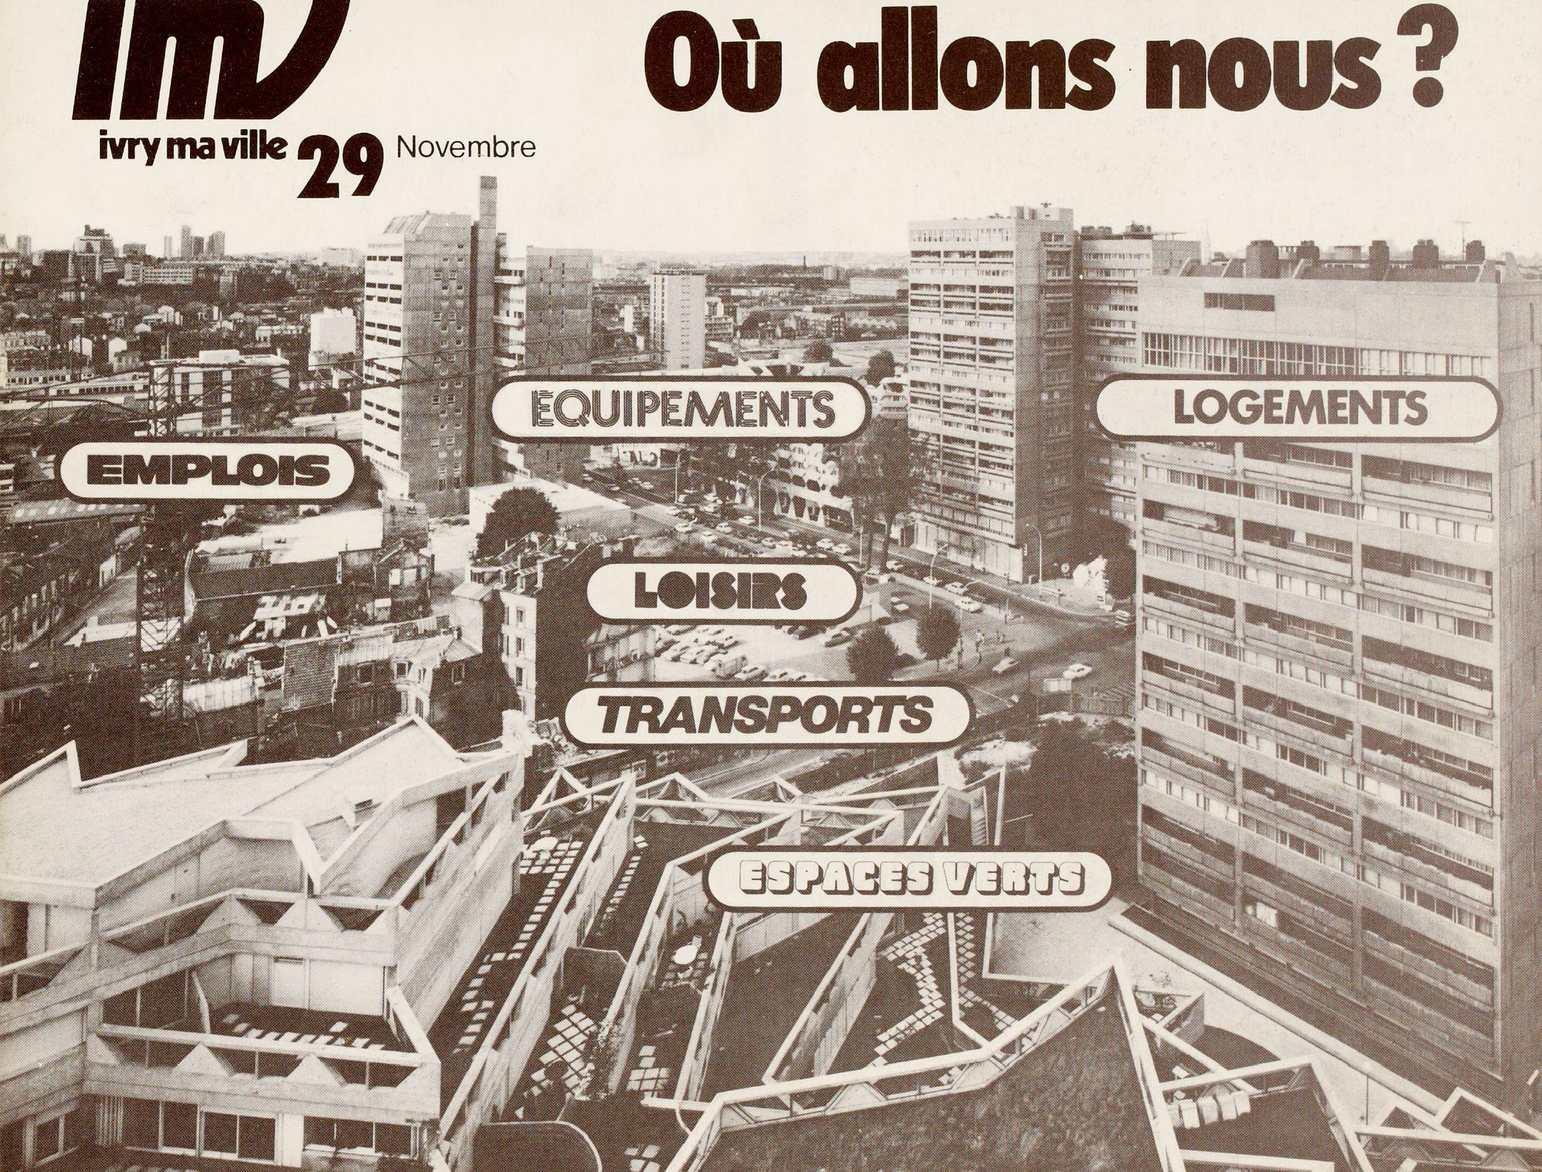 Calam o ivry ma ville n 29 novembre 1974 for Piscine ivry sur seine horaires